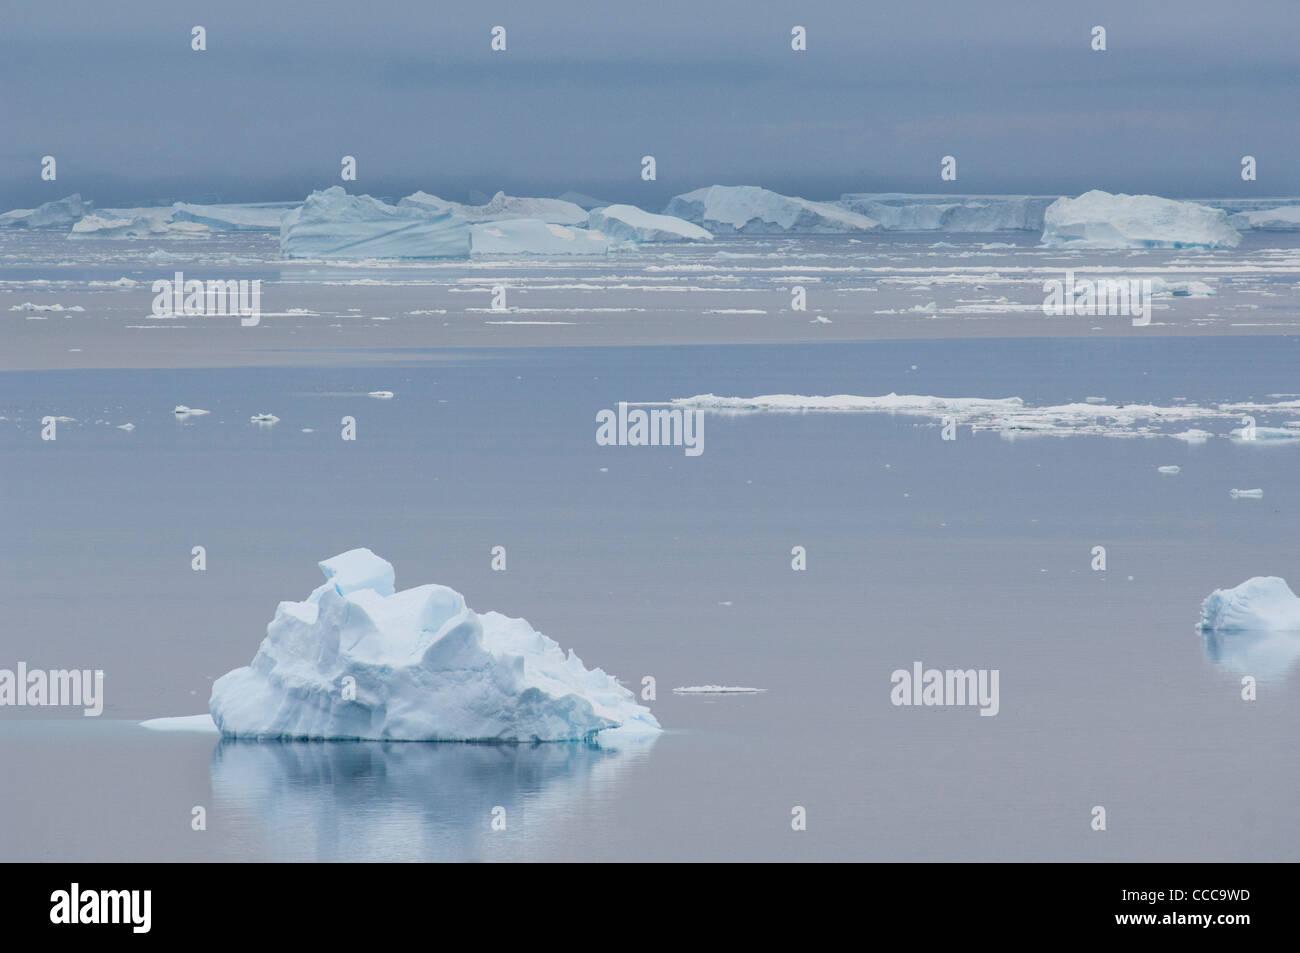 Antarctica, Antarctic Peninsula, Brown Bluff. Iceberg & bergy bits ice waterscape. Stock Photo